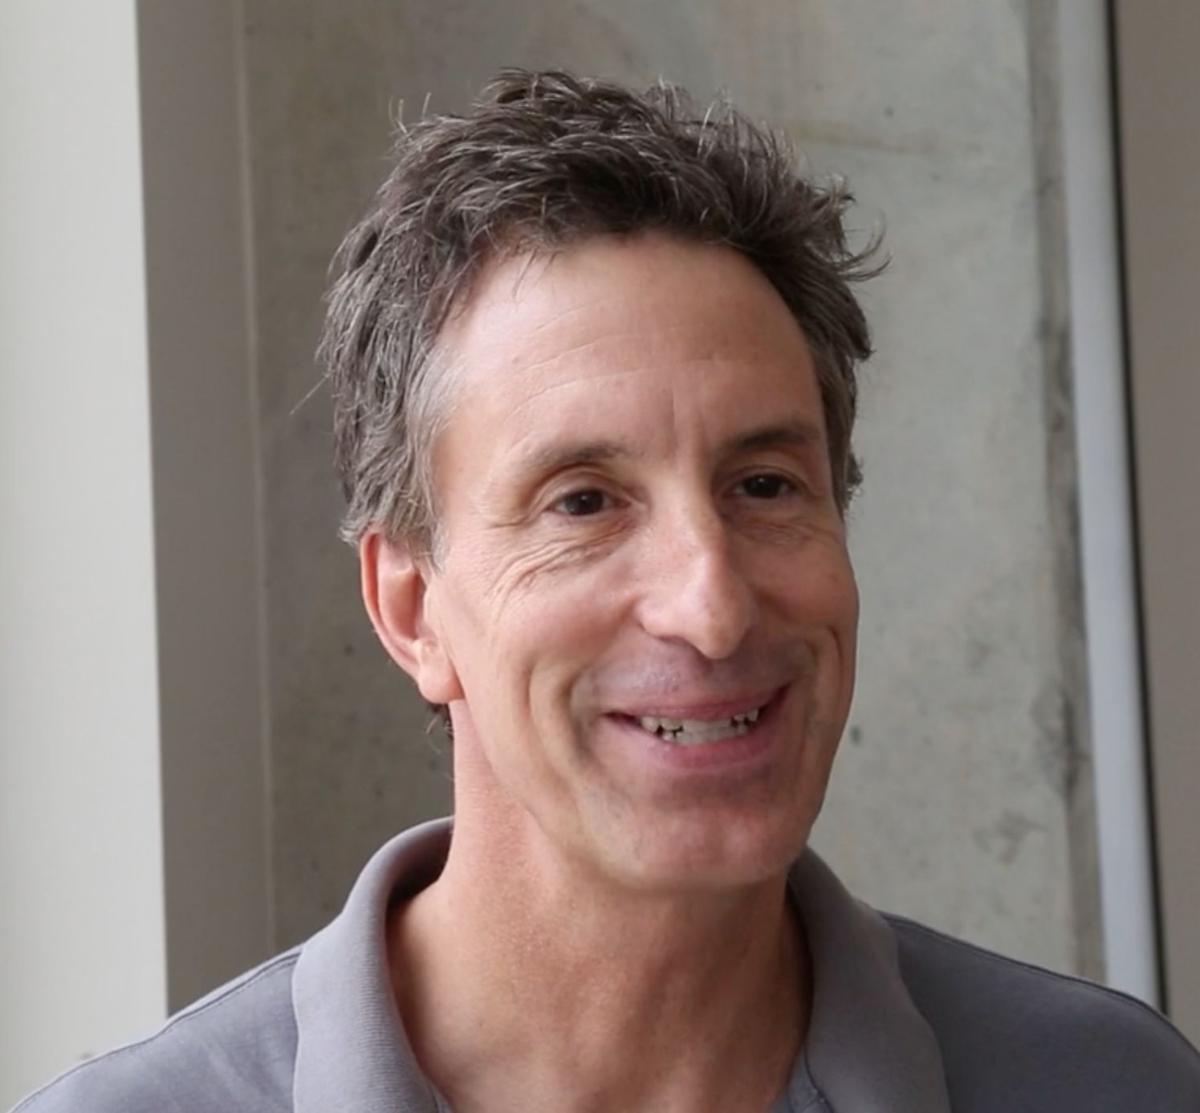 Rob Nowak, uw-madison engineering professor